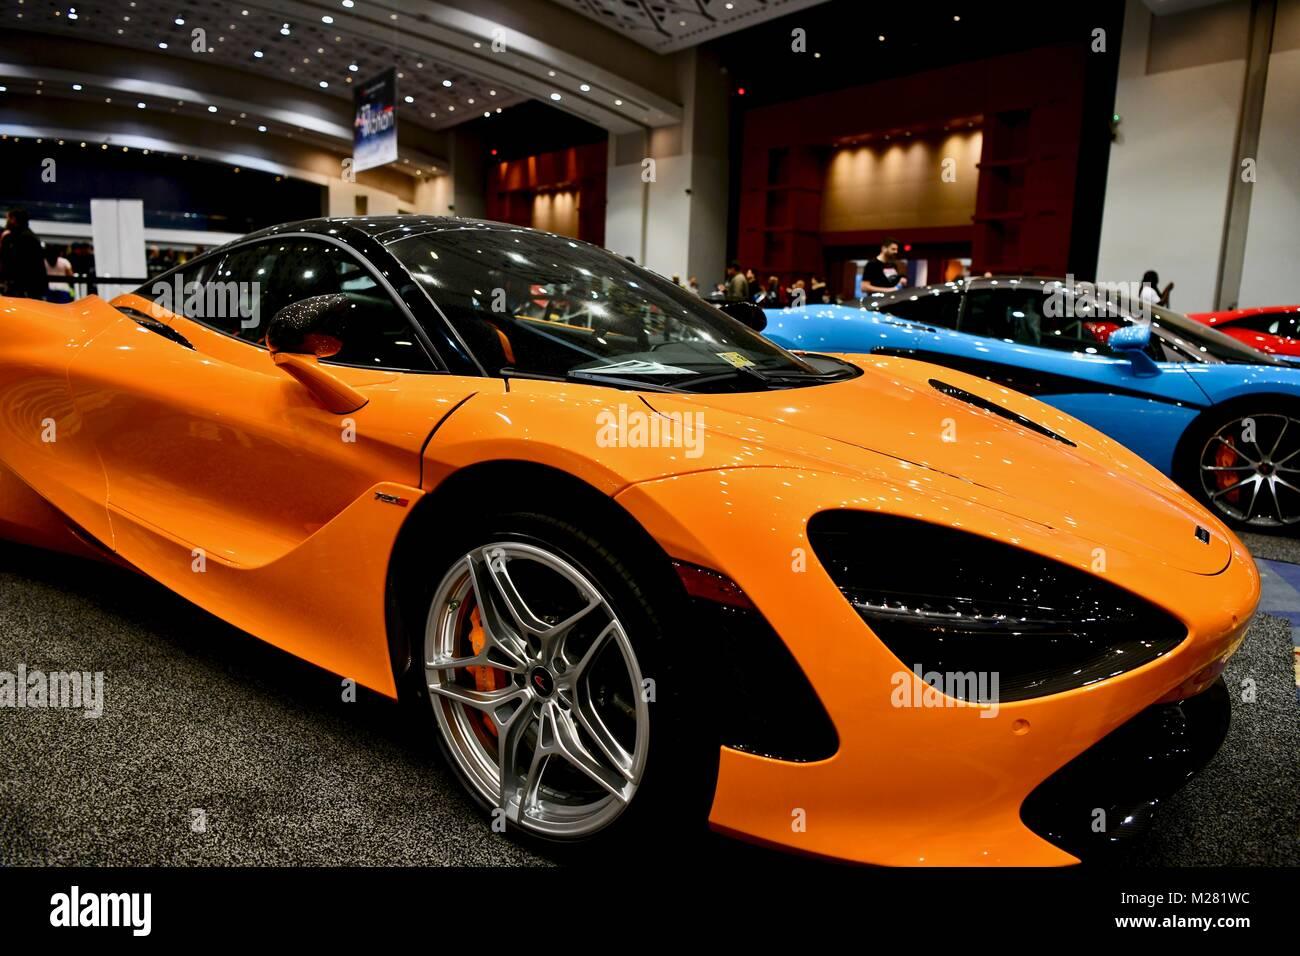 Washington Dc Car Show Stock Photos Washington Dc Car Show Stock - 2018 car show dc